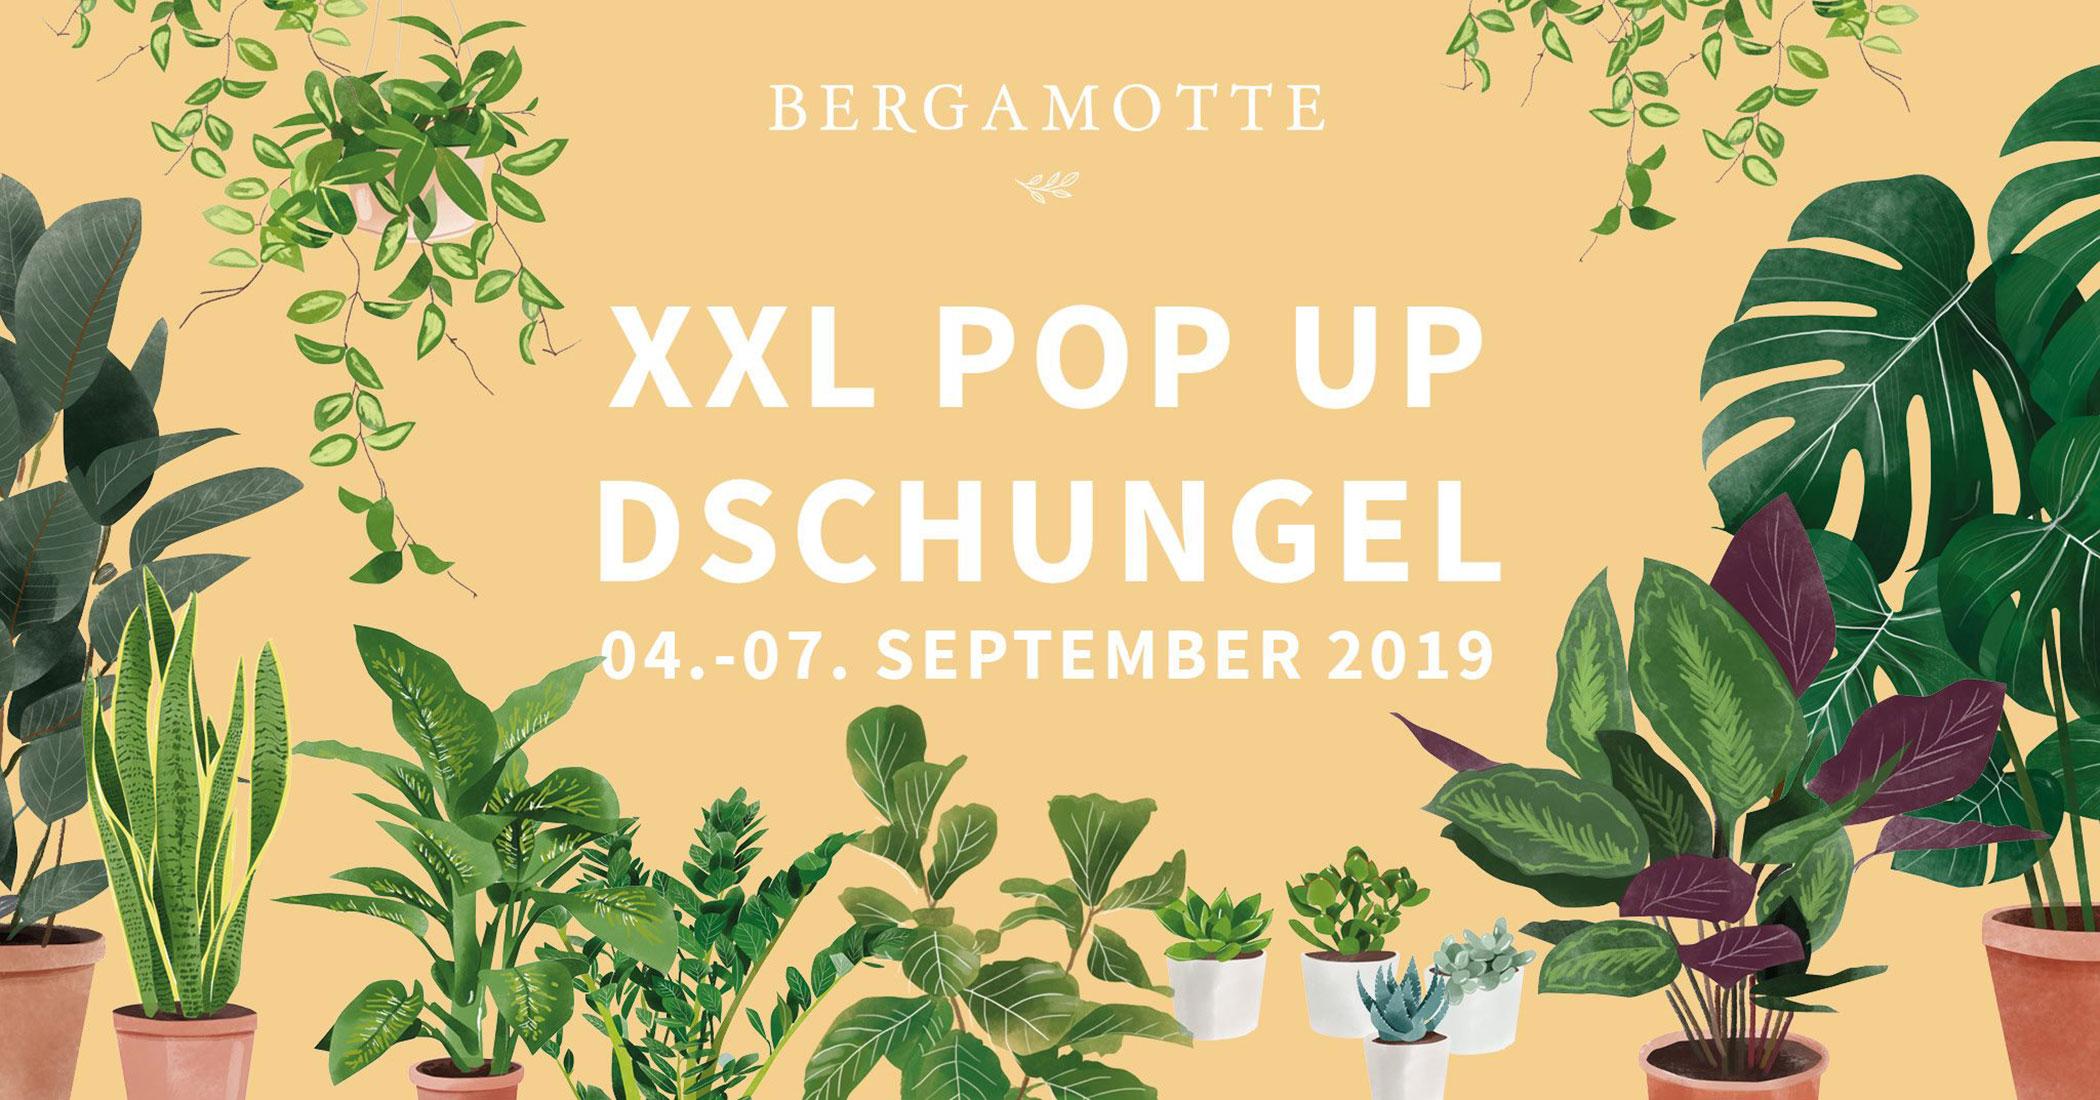 Bergamotte-pop-up